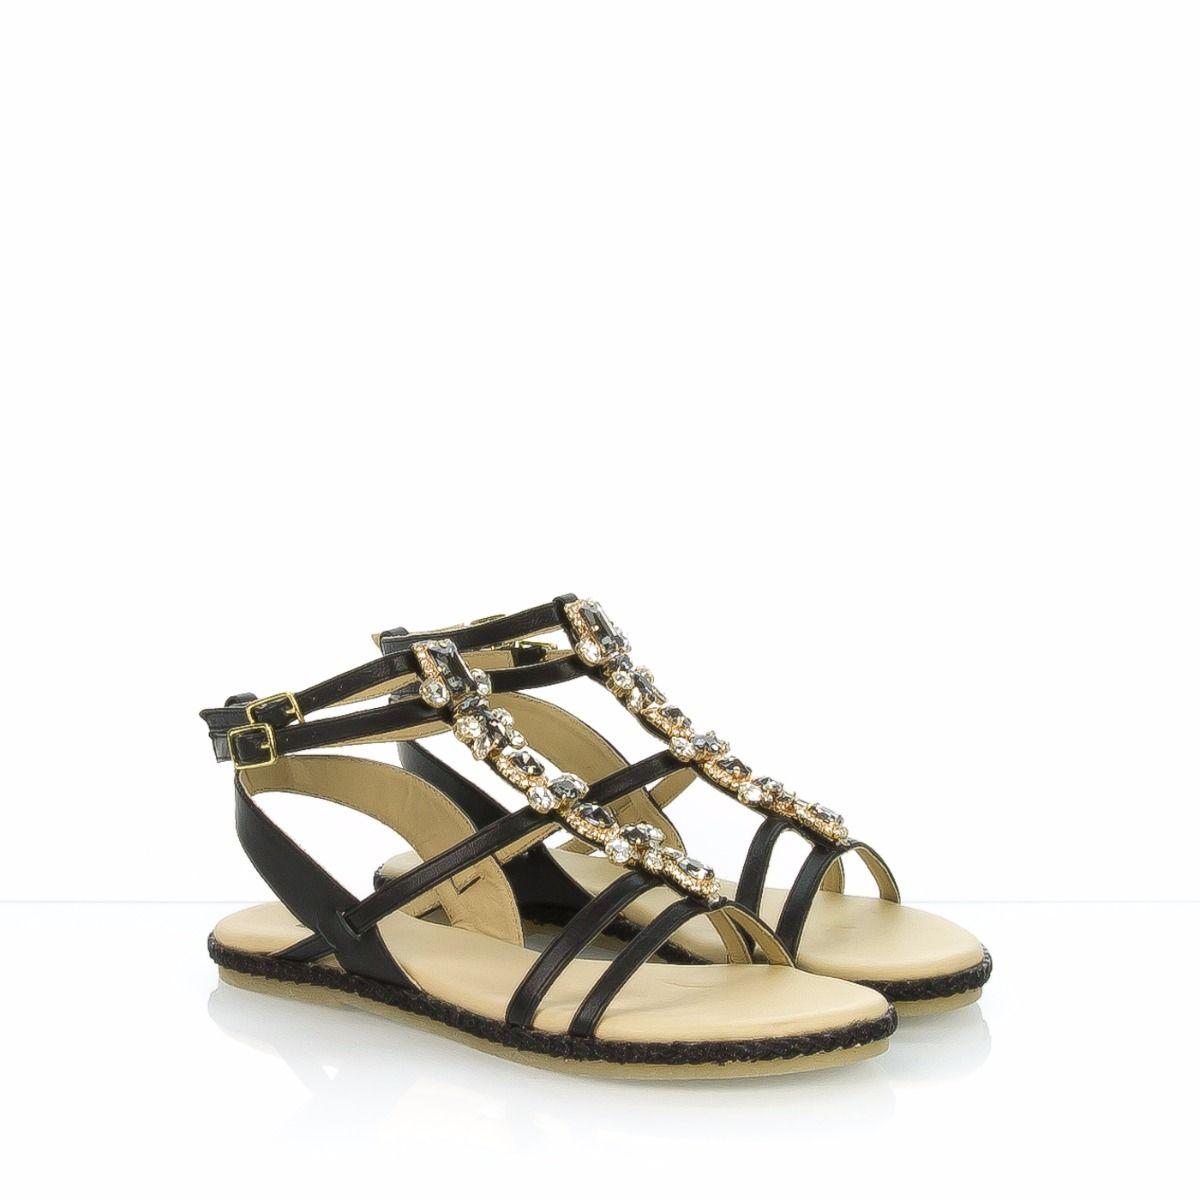 Nero Pietre 108426 Sandalo Donna Con Gioiello Stonefly OkuTPXZi